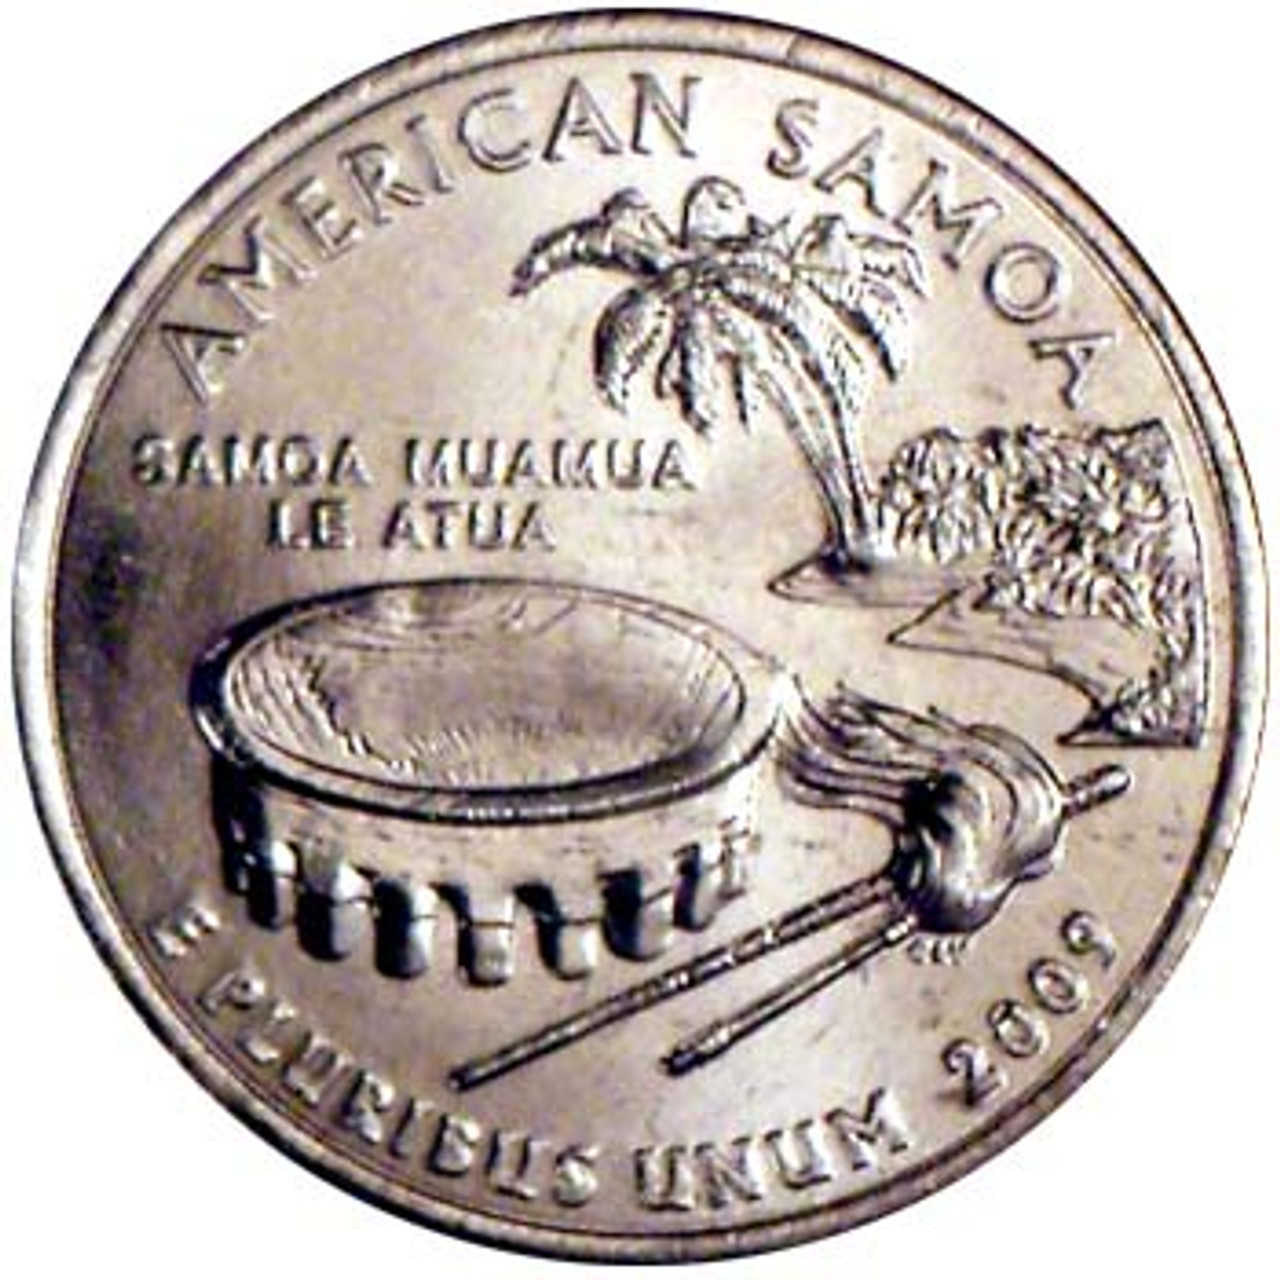 2009-D American Samoa Quarter Brilliant Uncirculated Image 1